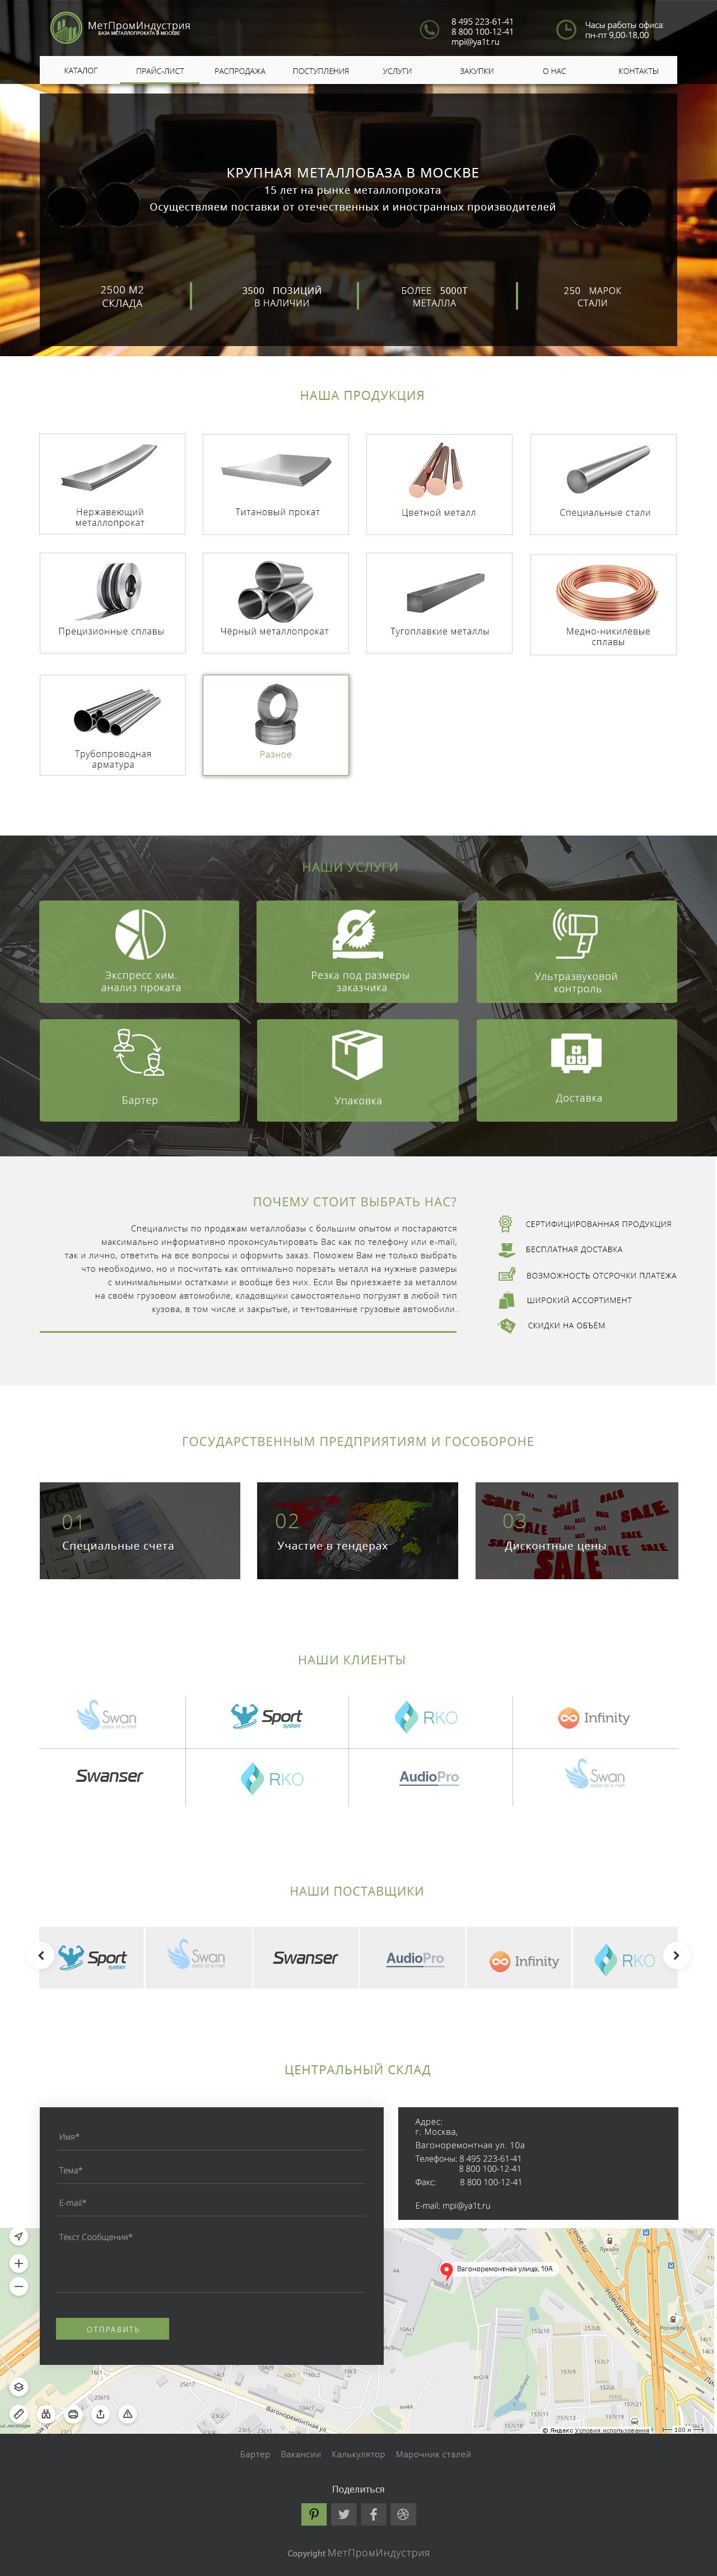 Дизайн сайта для металлоторгующей компании фото f_5705994290a0f689.jpg